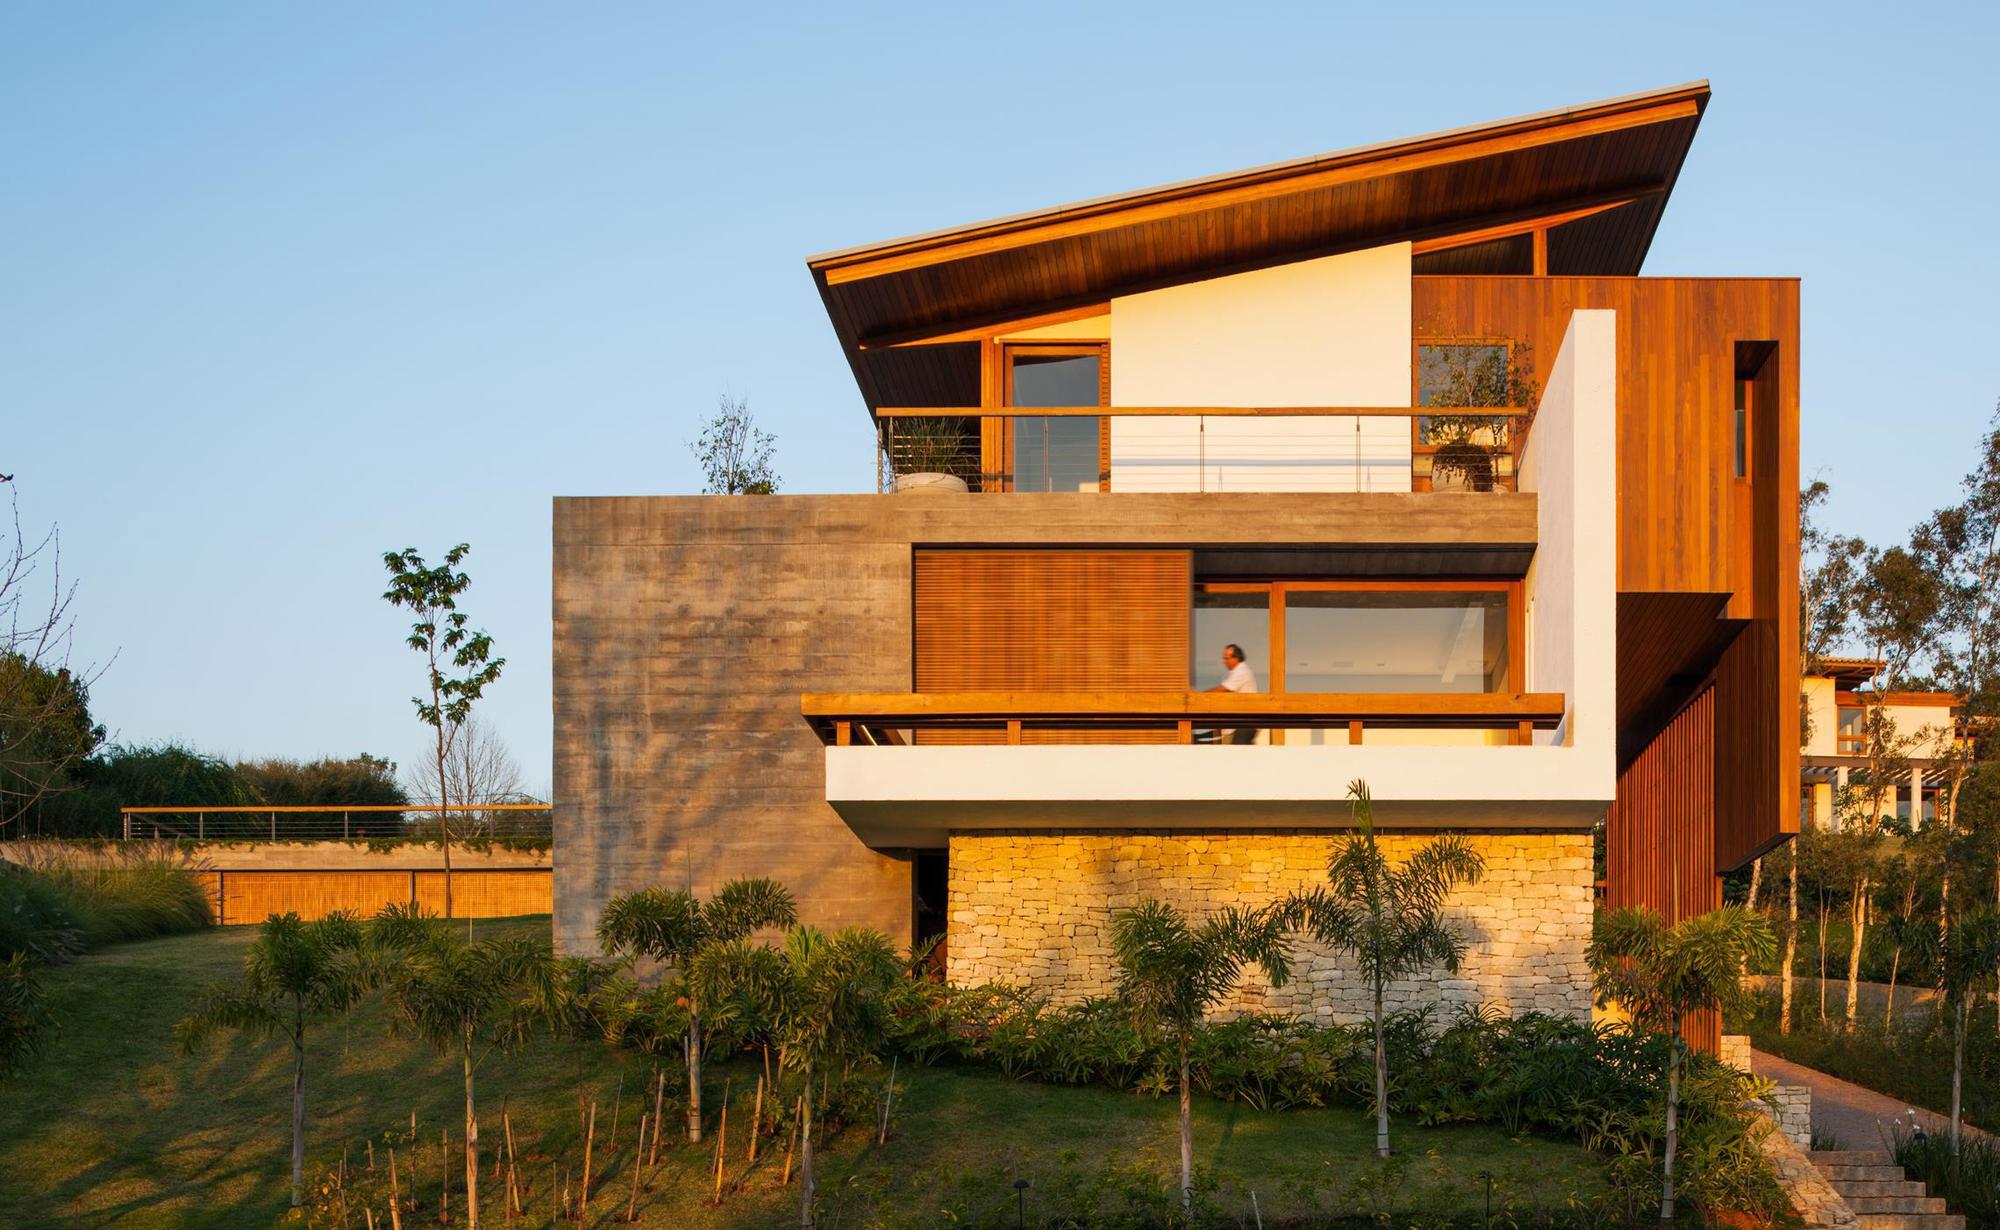 FT Modern Holiday and Weekend House by Reinach Mendonça Arquitetos Associados-16